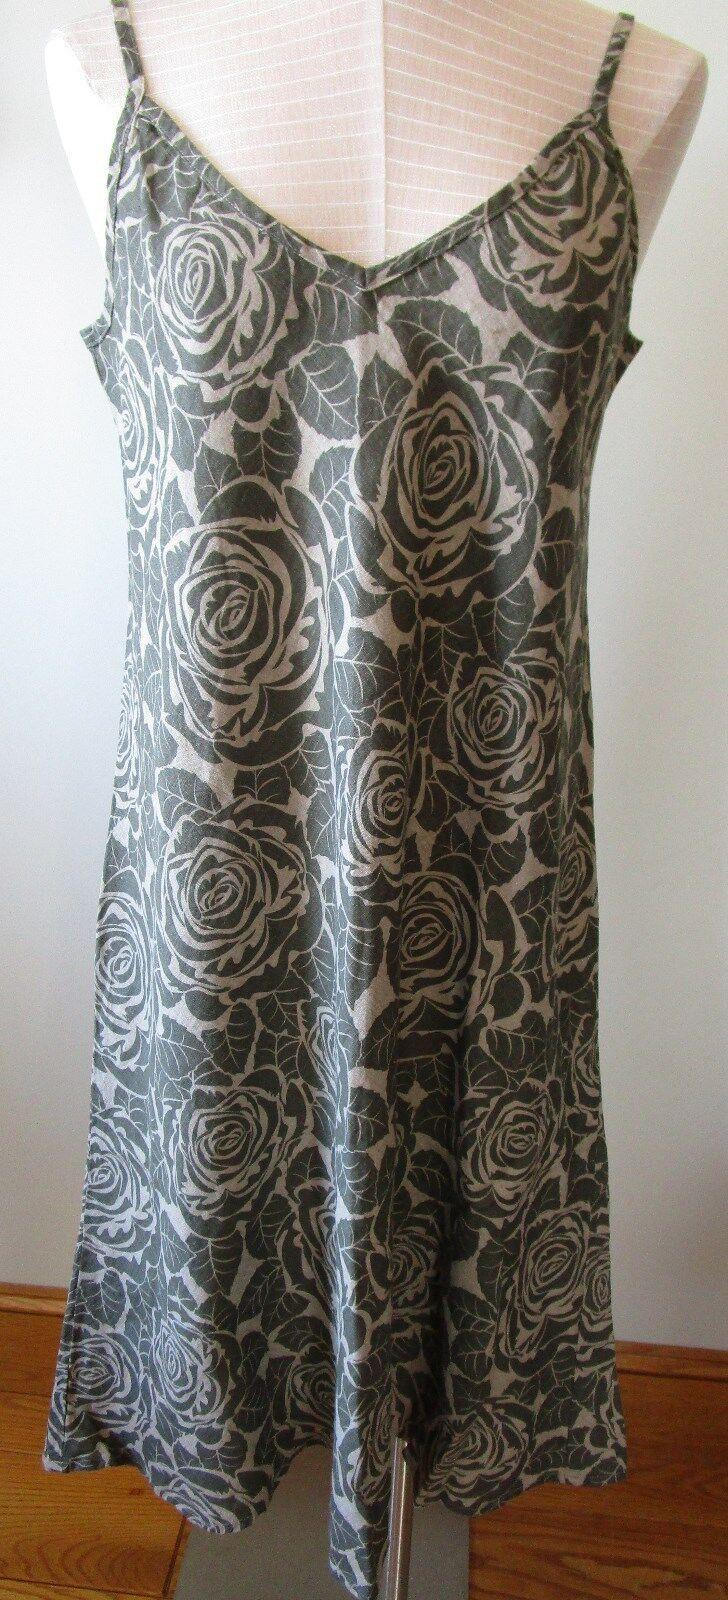 FLAX  Designs  Linen    Dress   L    NWOT  Bias TeA    NATURAL CLEARANCE